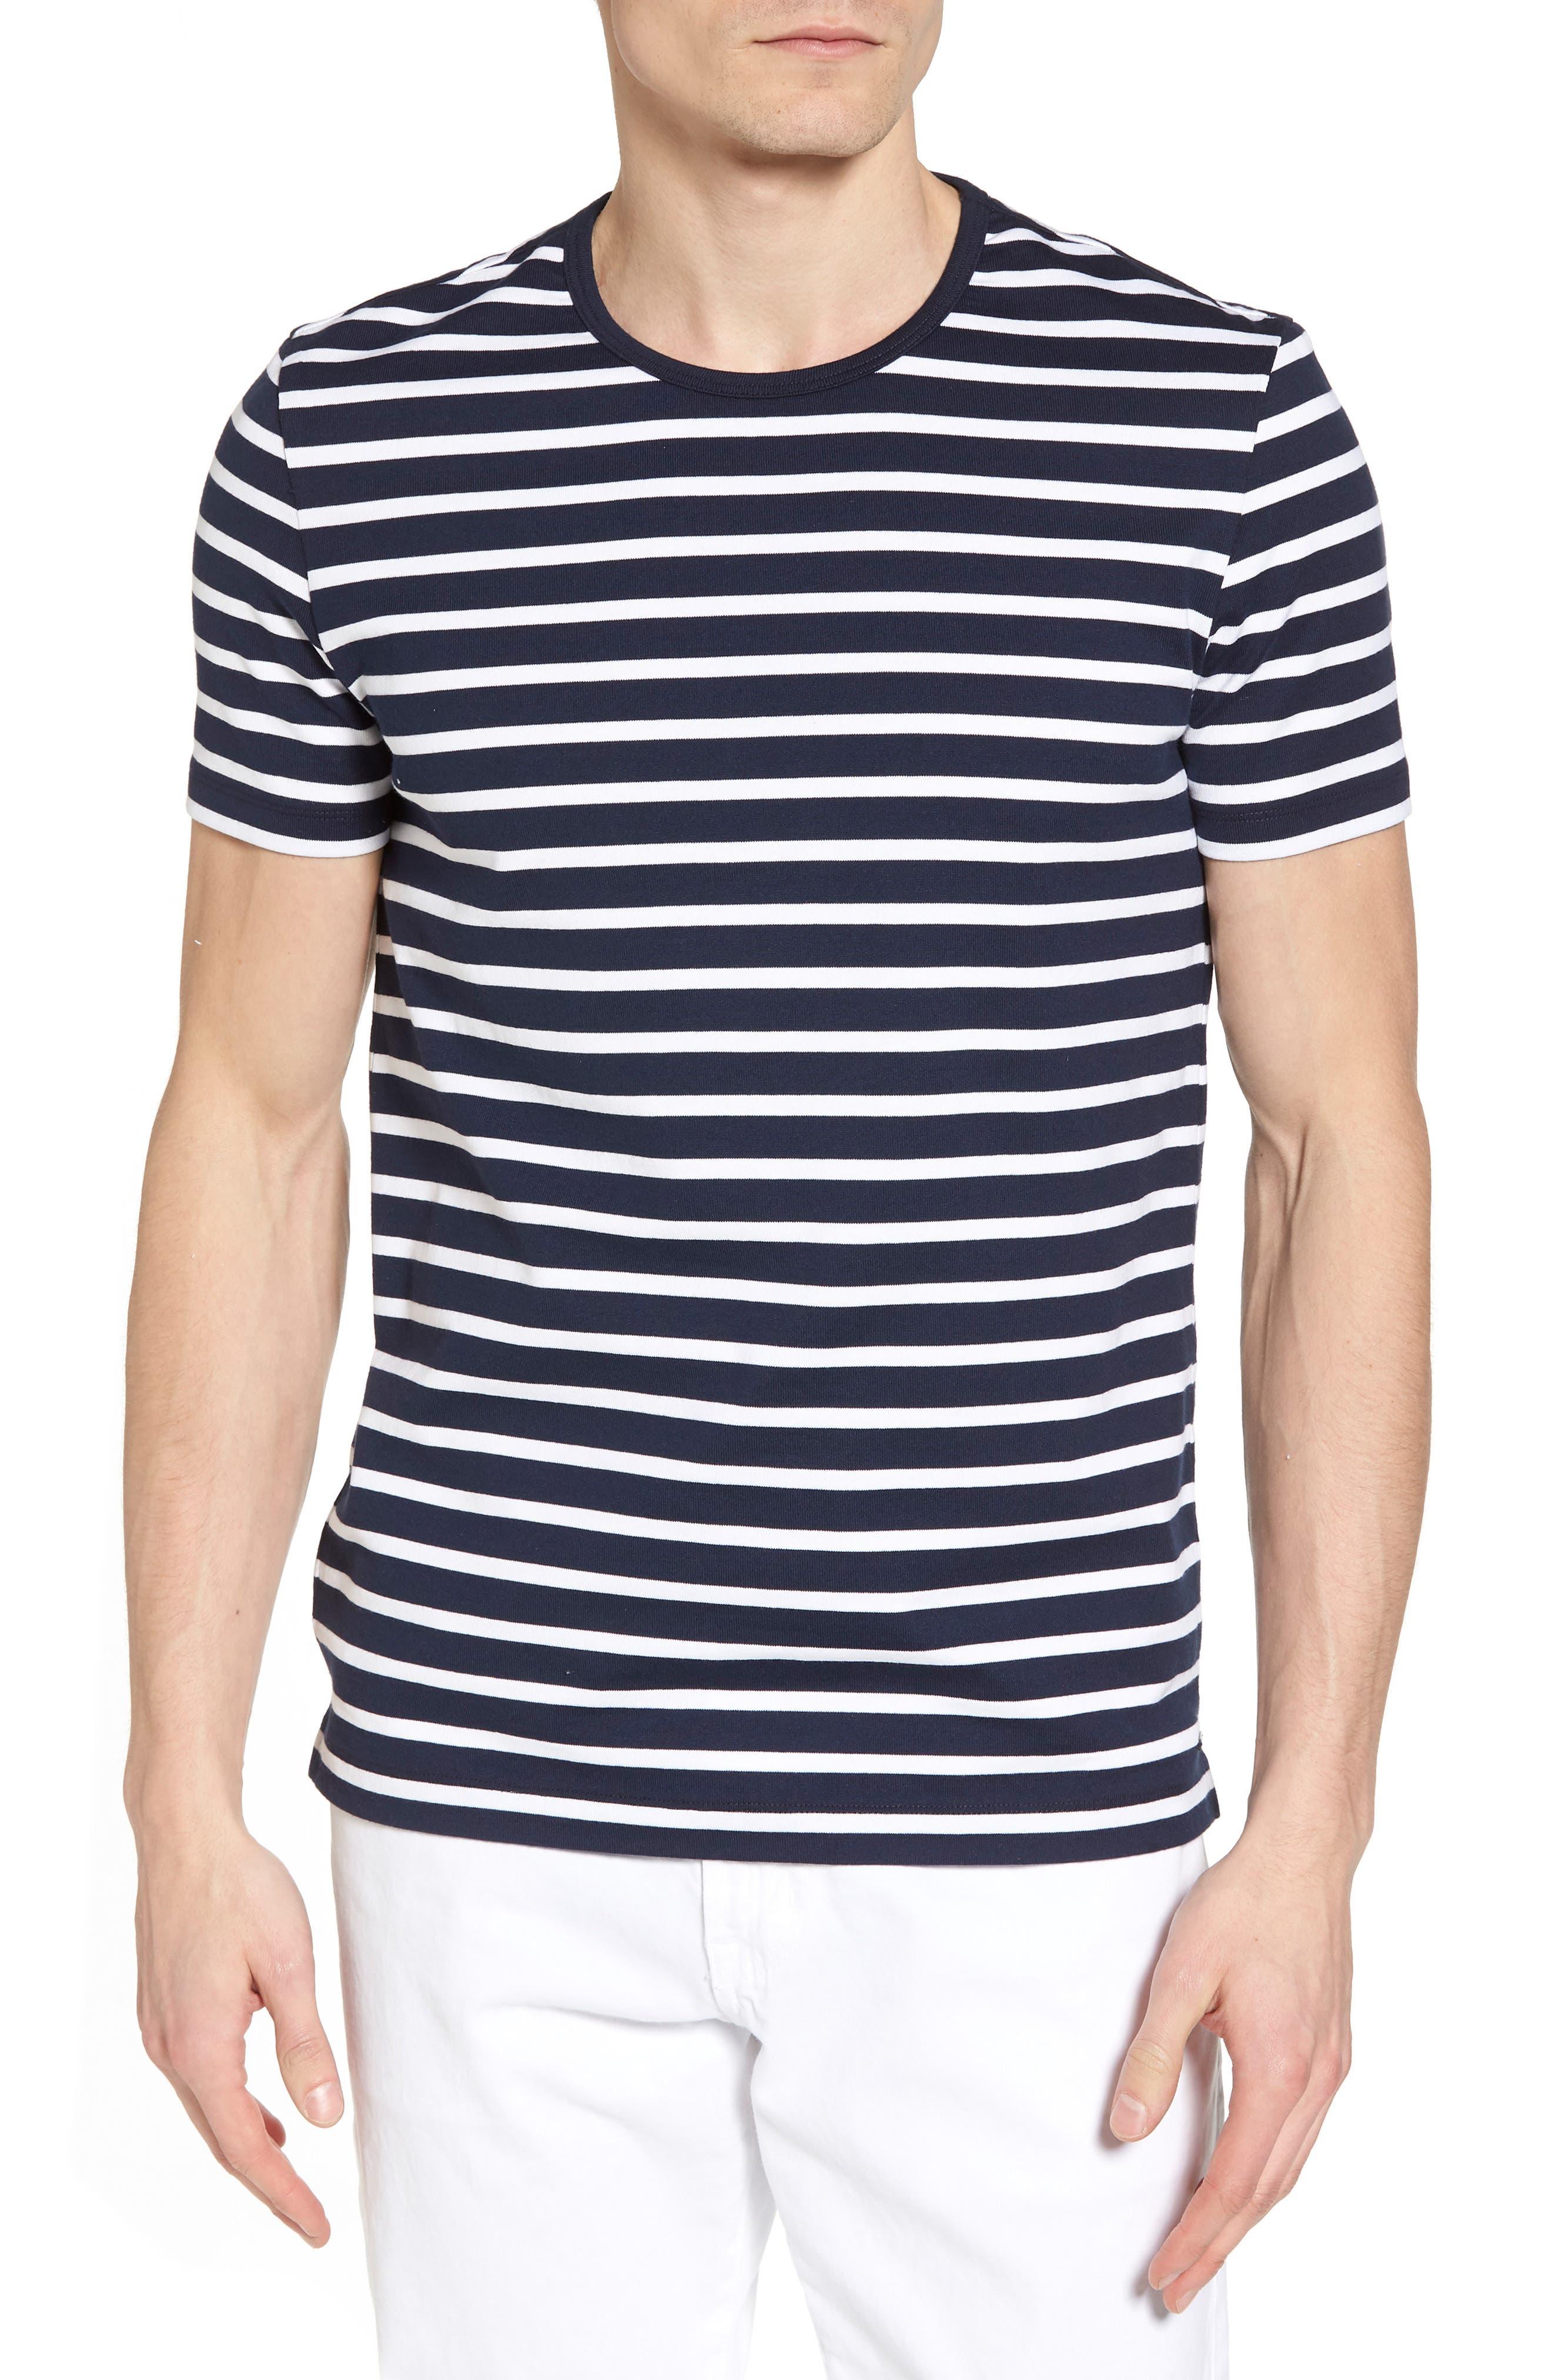 Tessler Stripe Crewneck T-Shirt,                             Main thumbnail 1, color,                             410